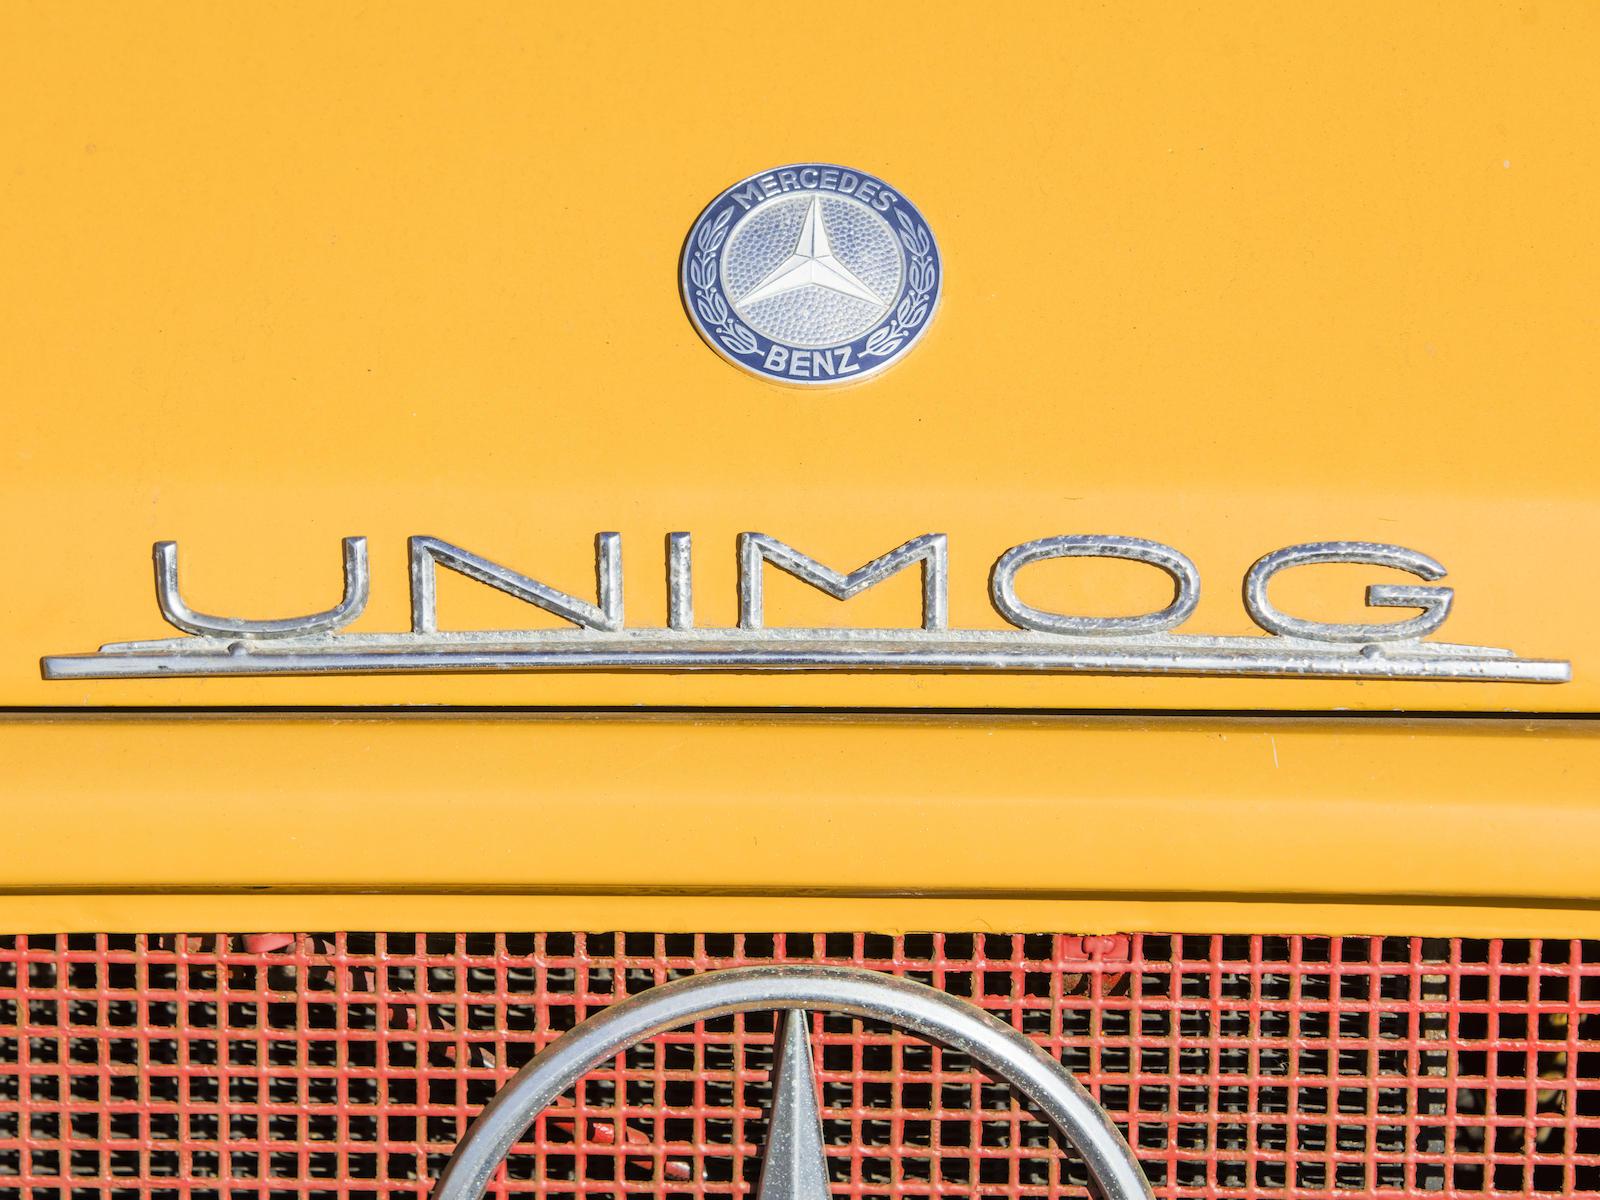 1966 Mercedes-Benz Unimog Car Hauler front hood decal details